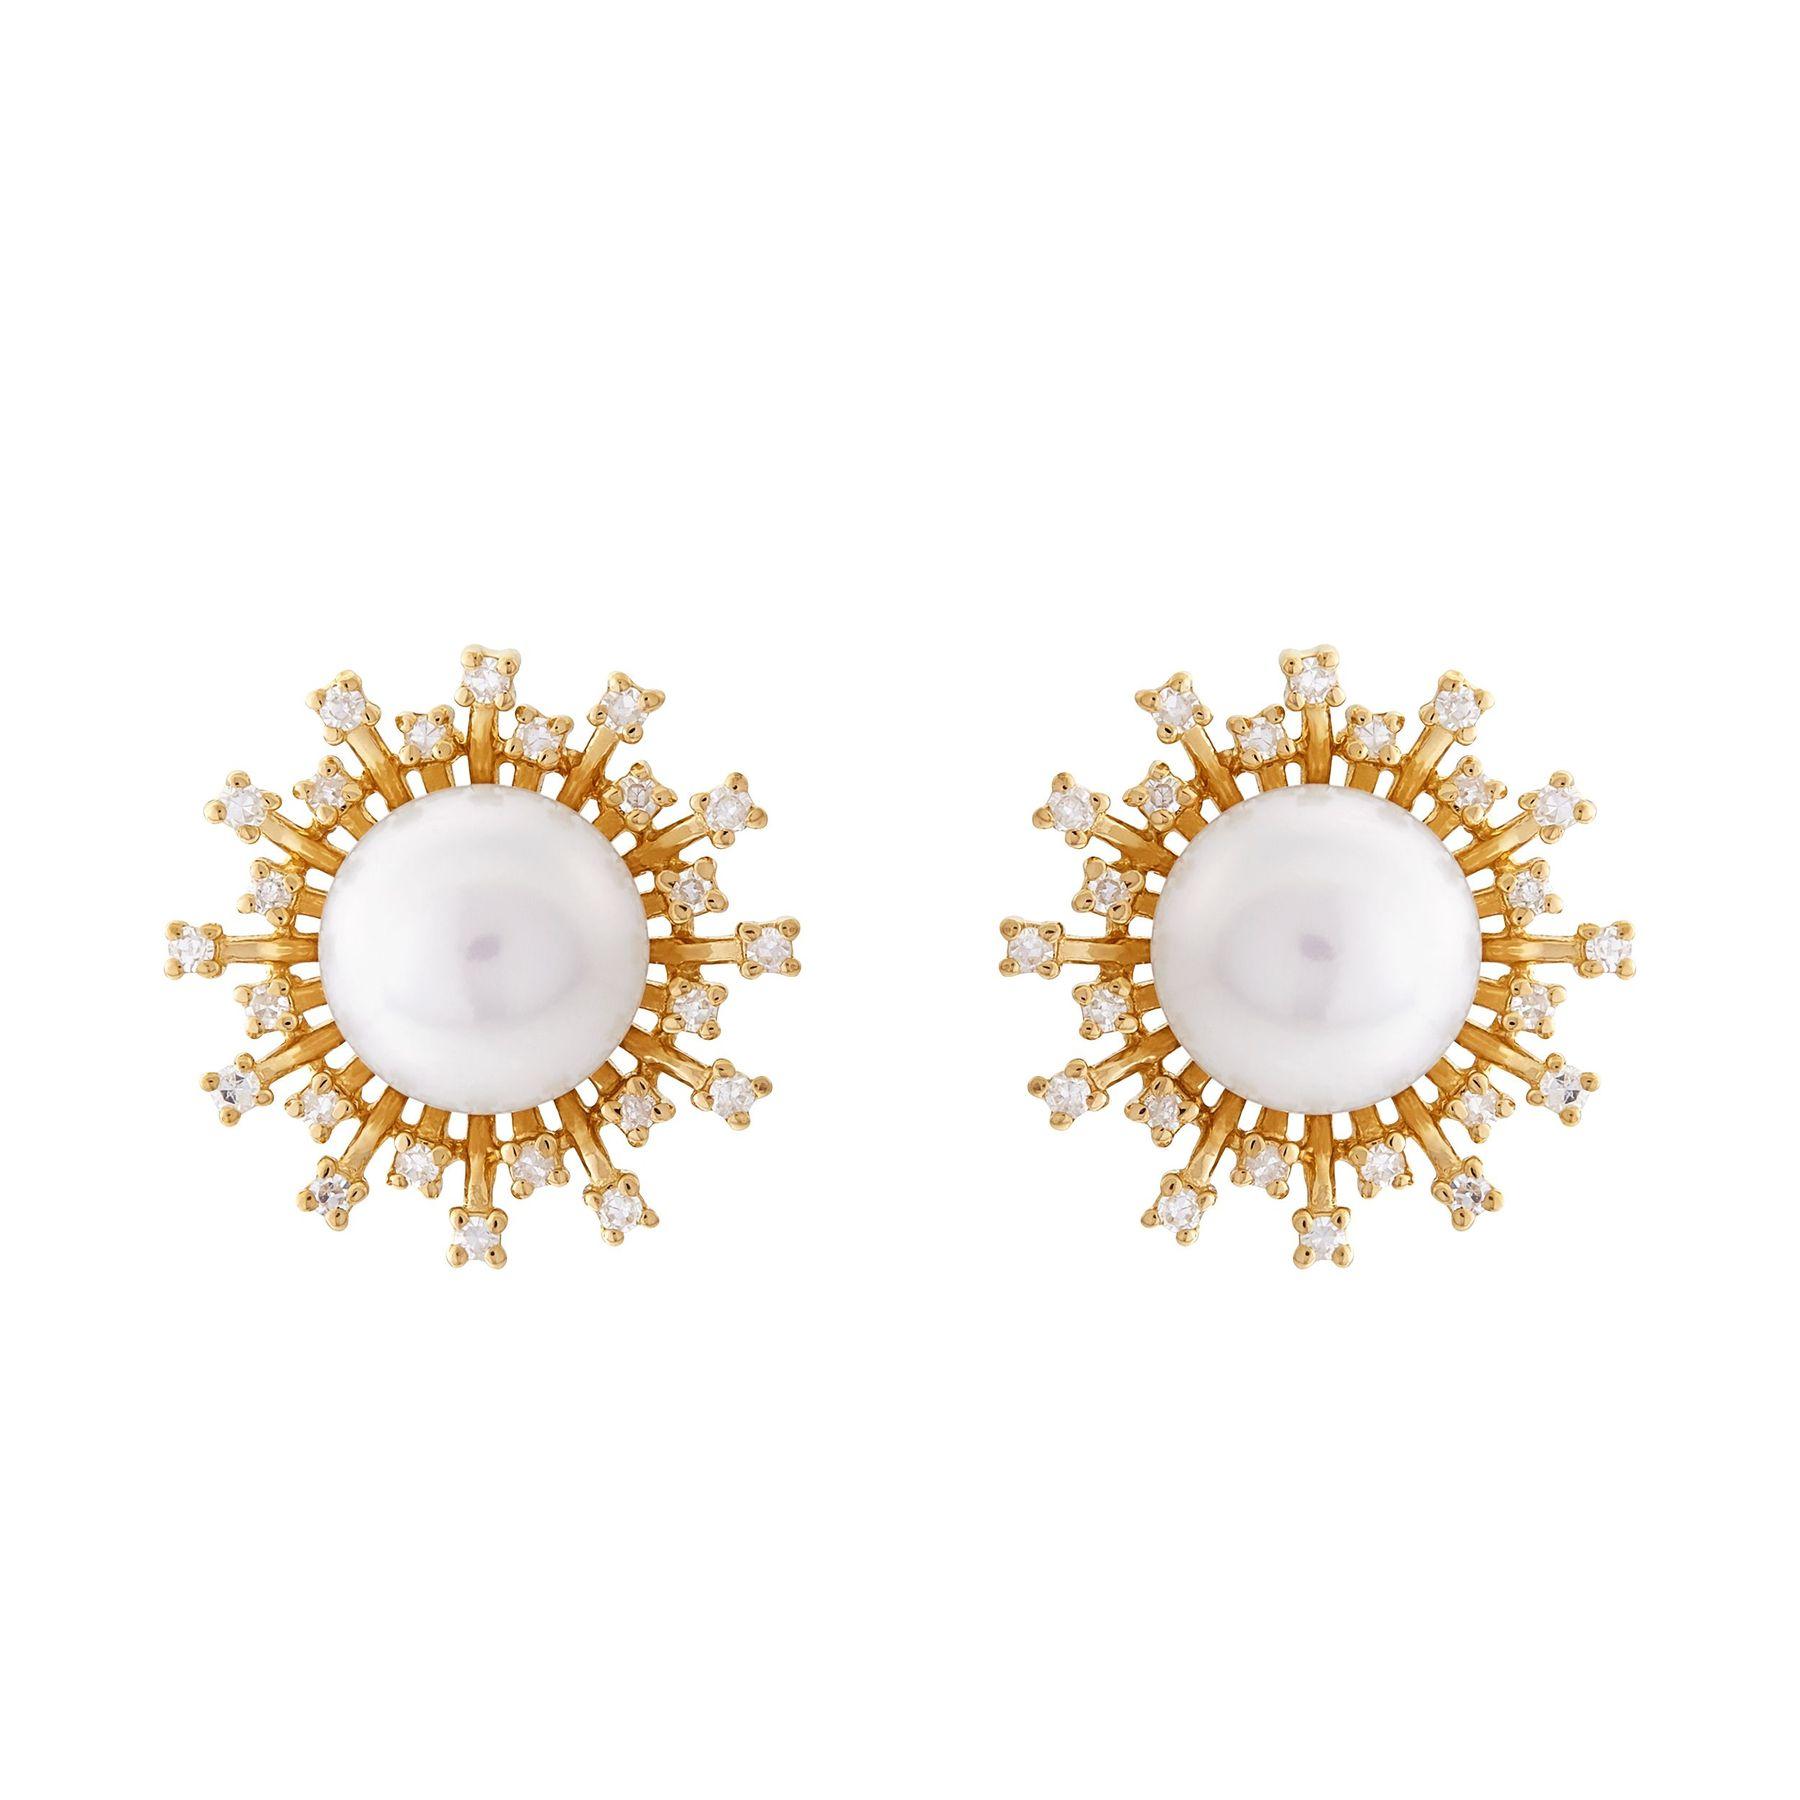 daa1bef2e Honora 7-7.5 mm Freshwater Pearl & 1/5 ct Diamond Sunburst Earrings ...